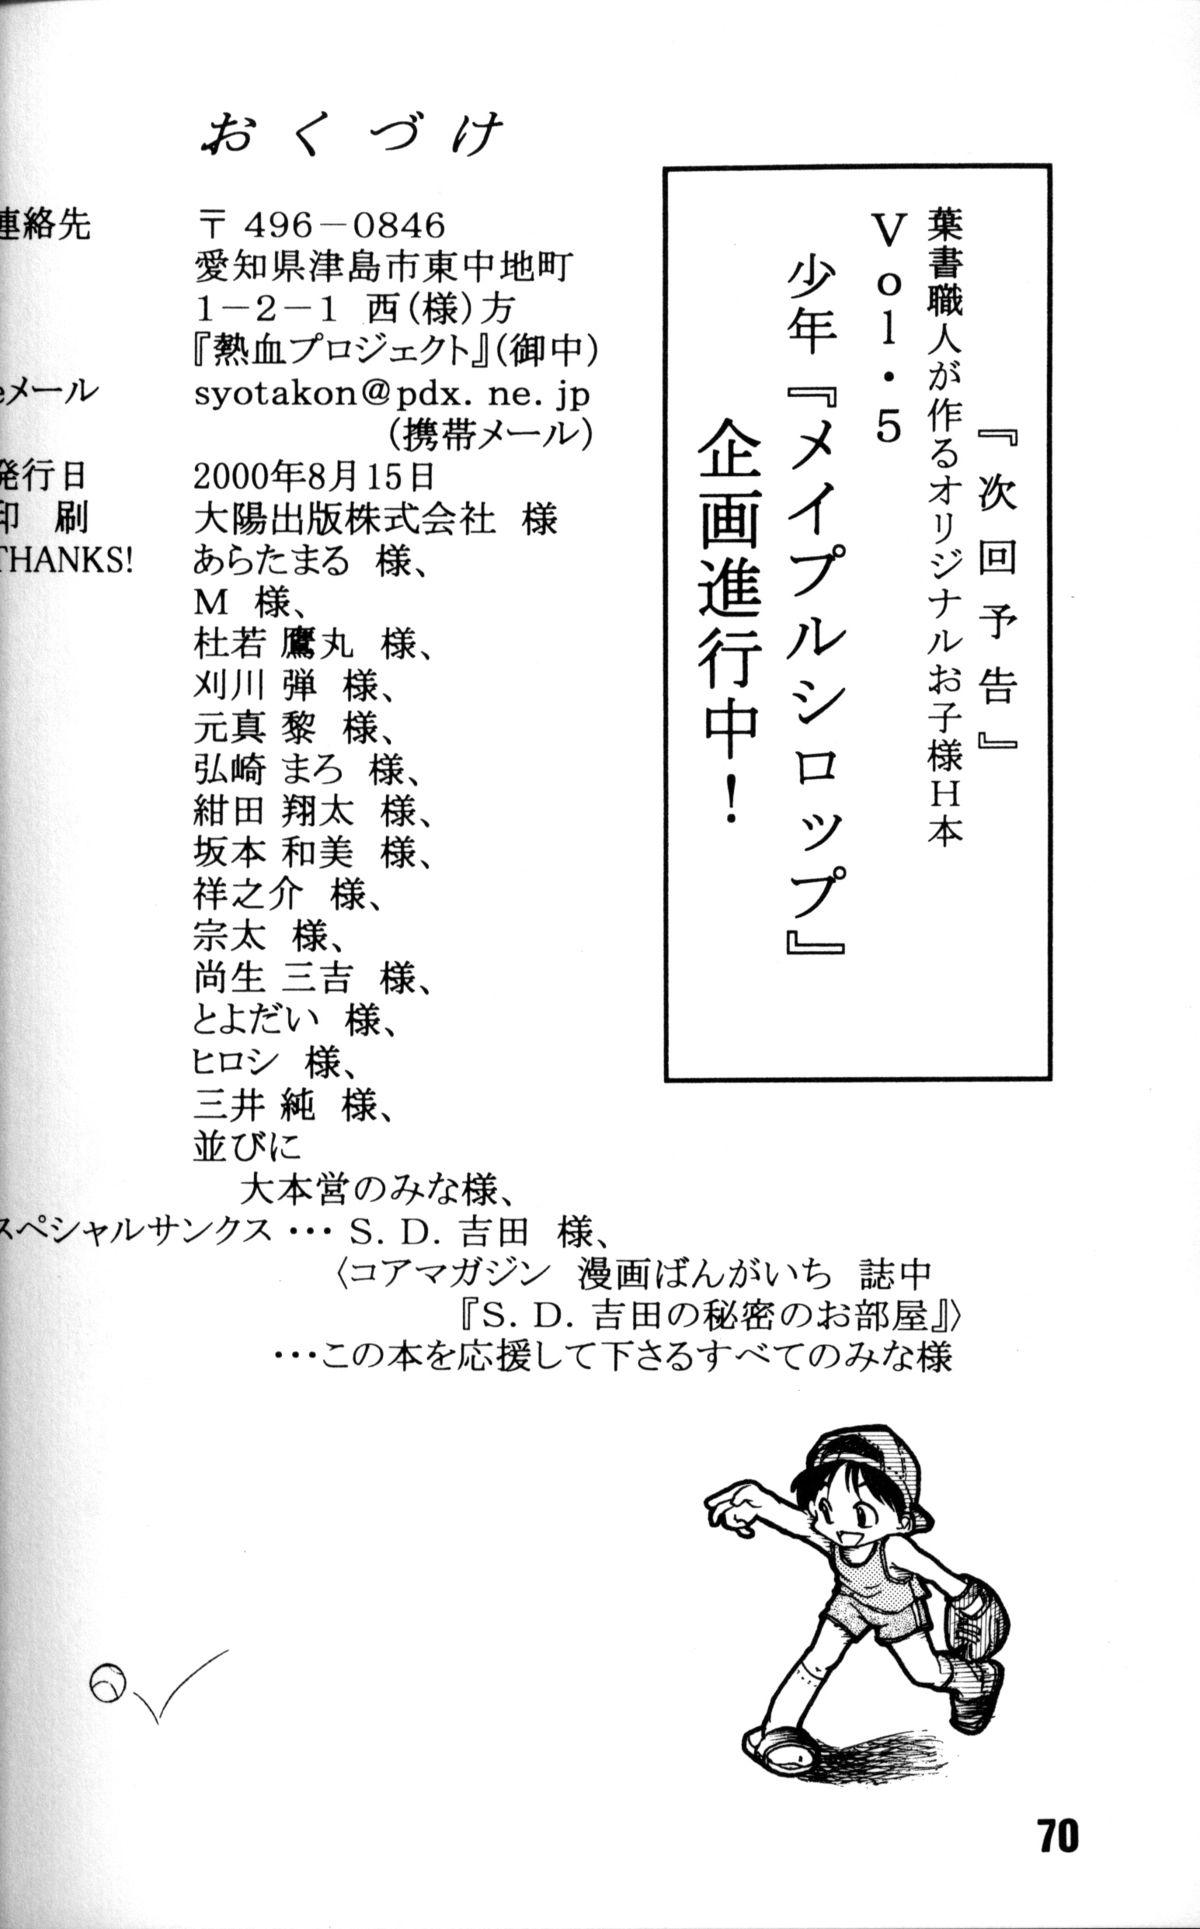 Anthology - Nekketsu Project - Volume 4 'Shounen Vanilla Essence' 68